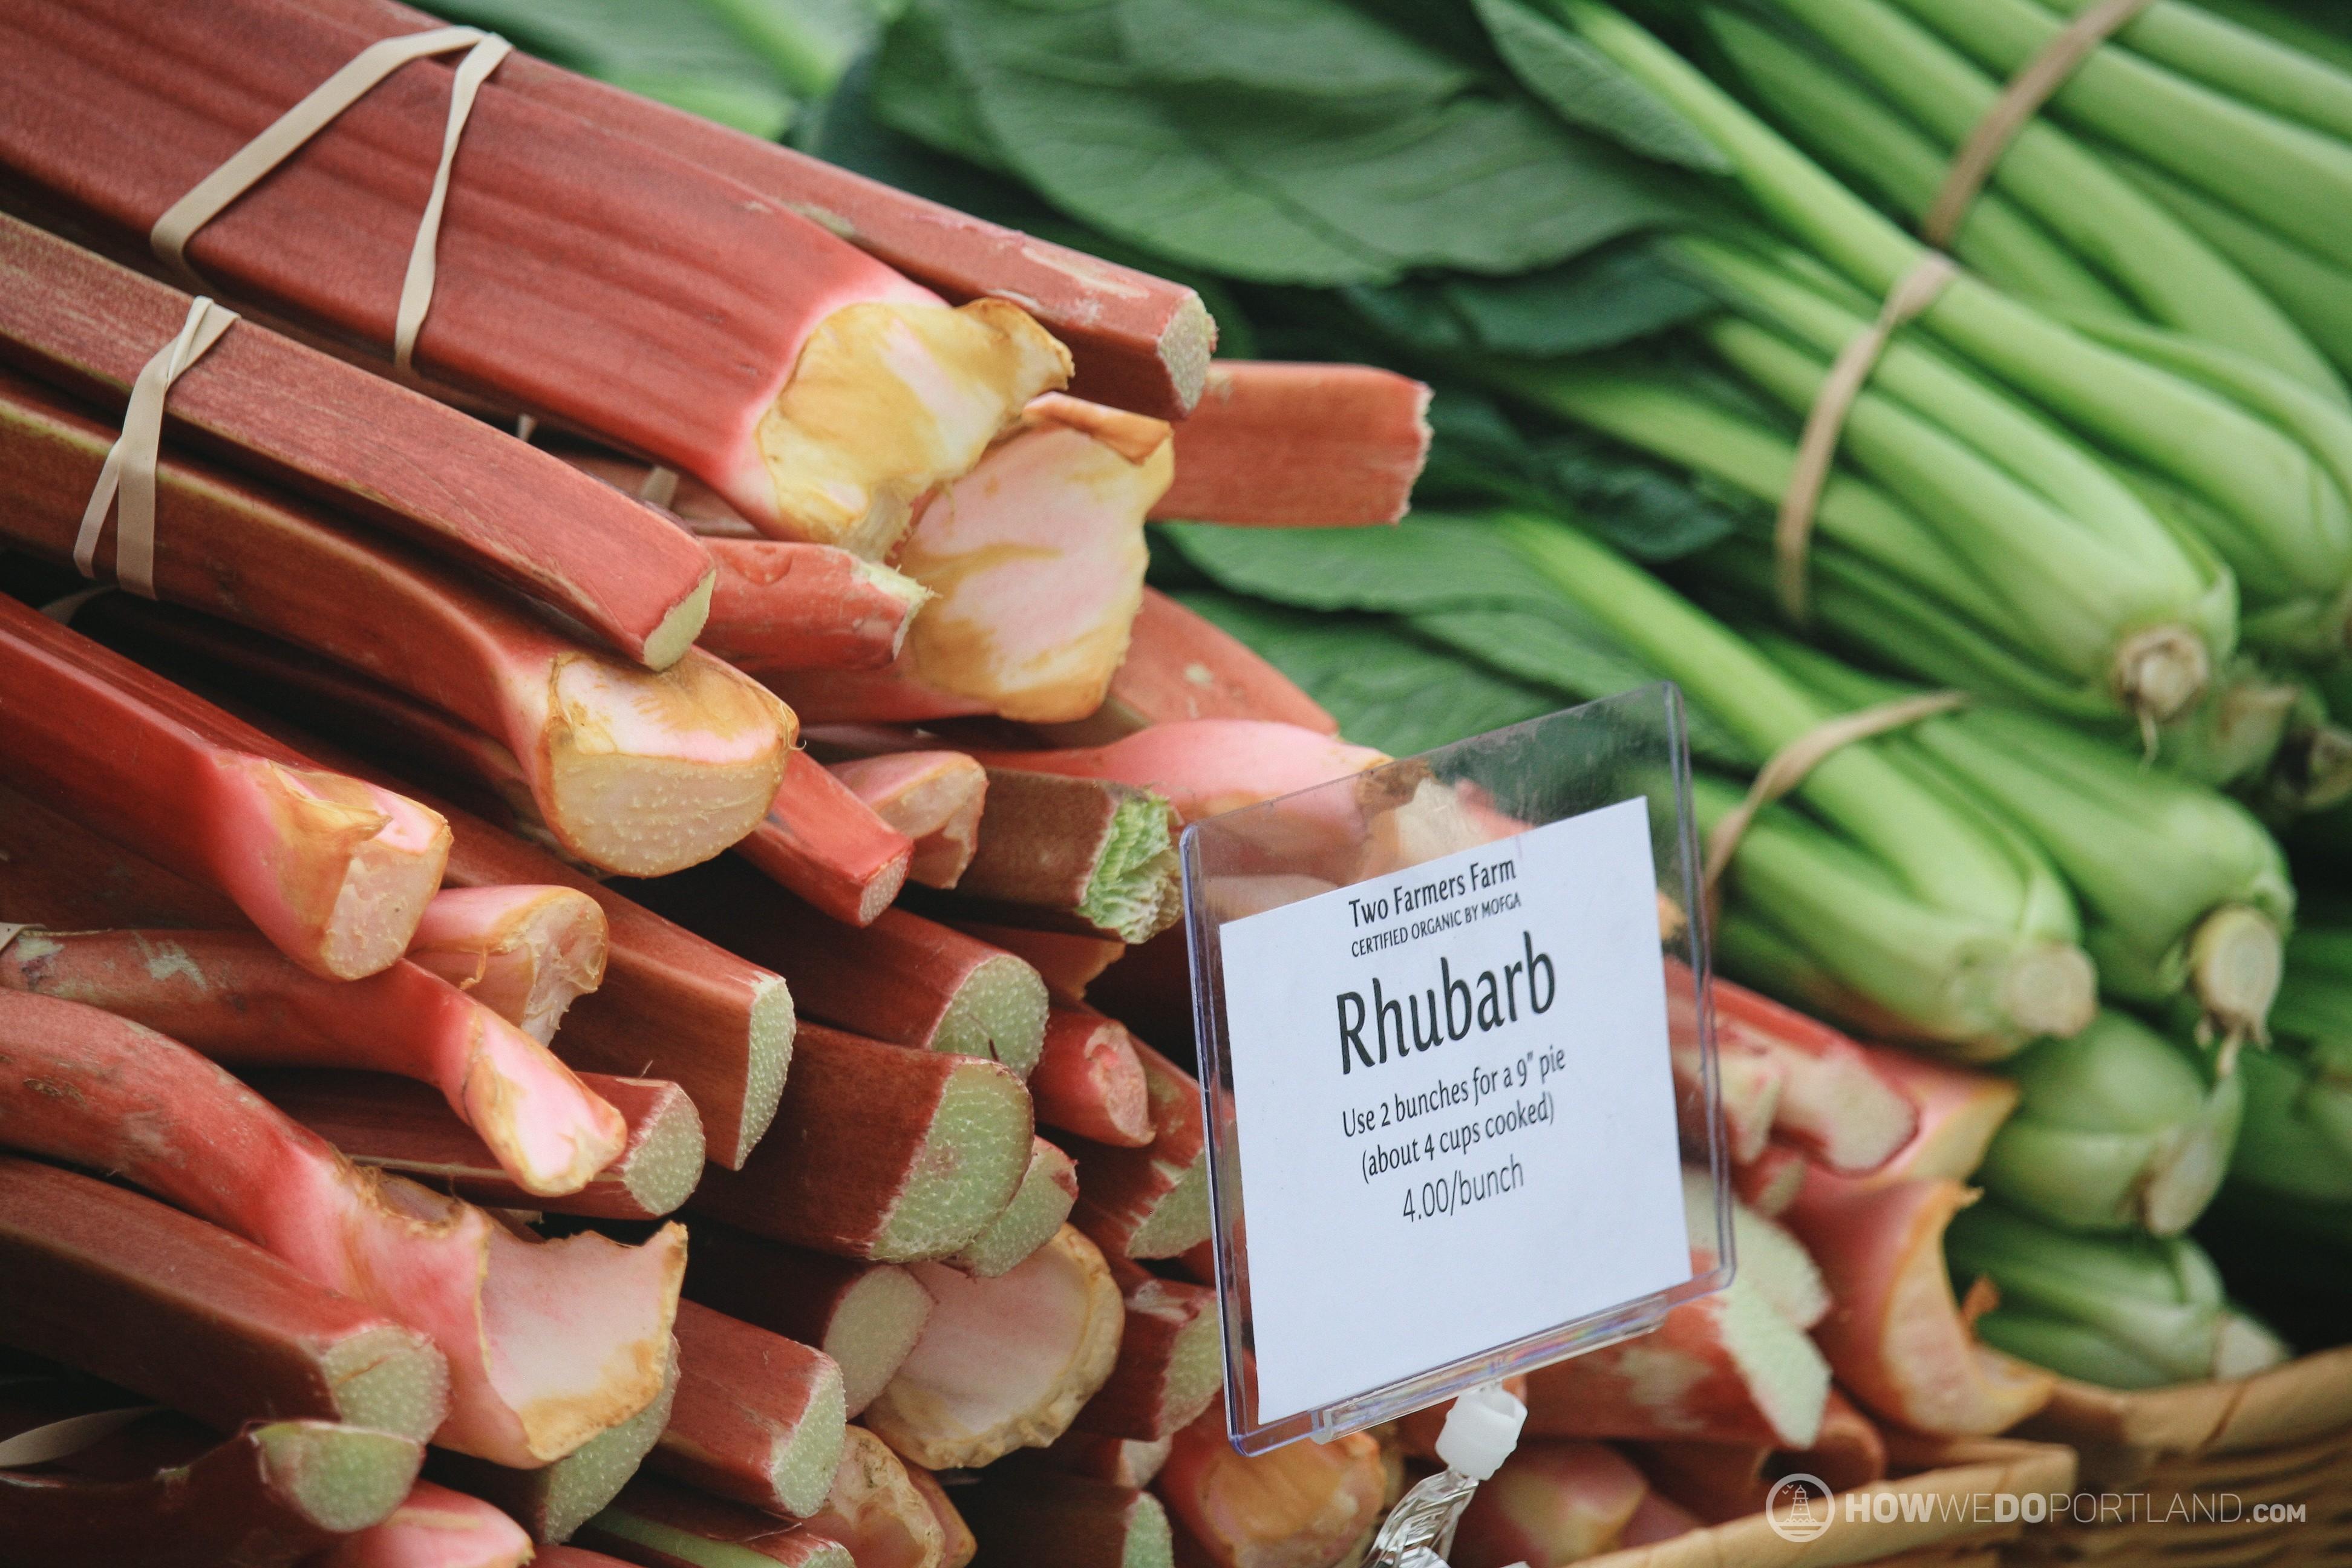 Fresh Rhubarb from Two Farmers Farm